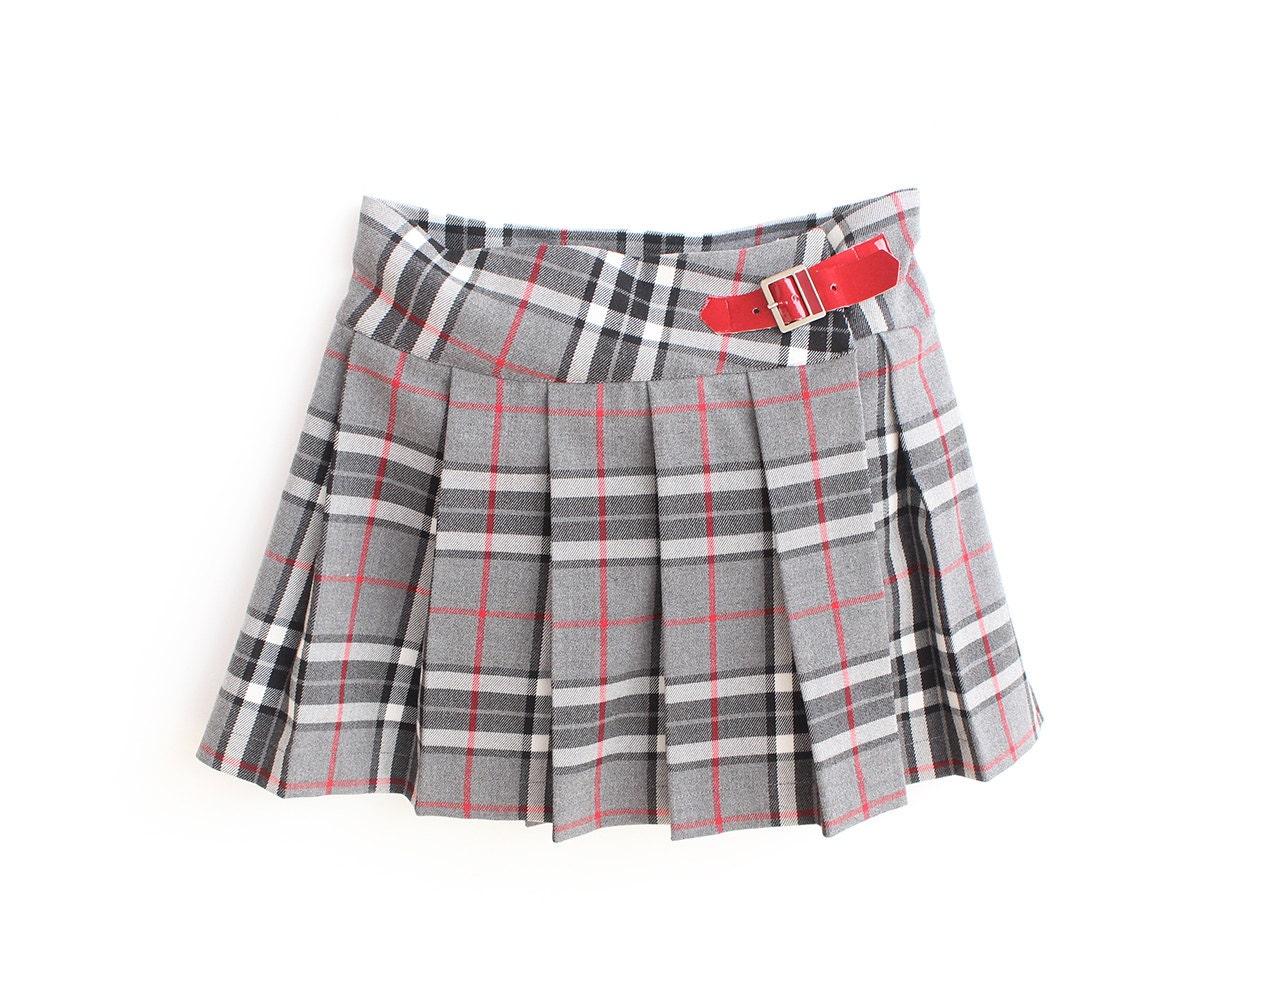 BONNIE WEE Kilt Girl Skirt pattern Pdf sewing Tartan or ANY